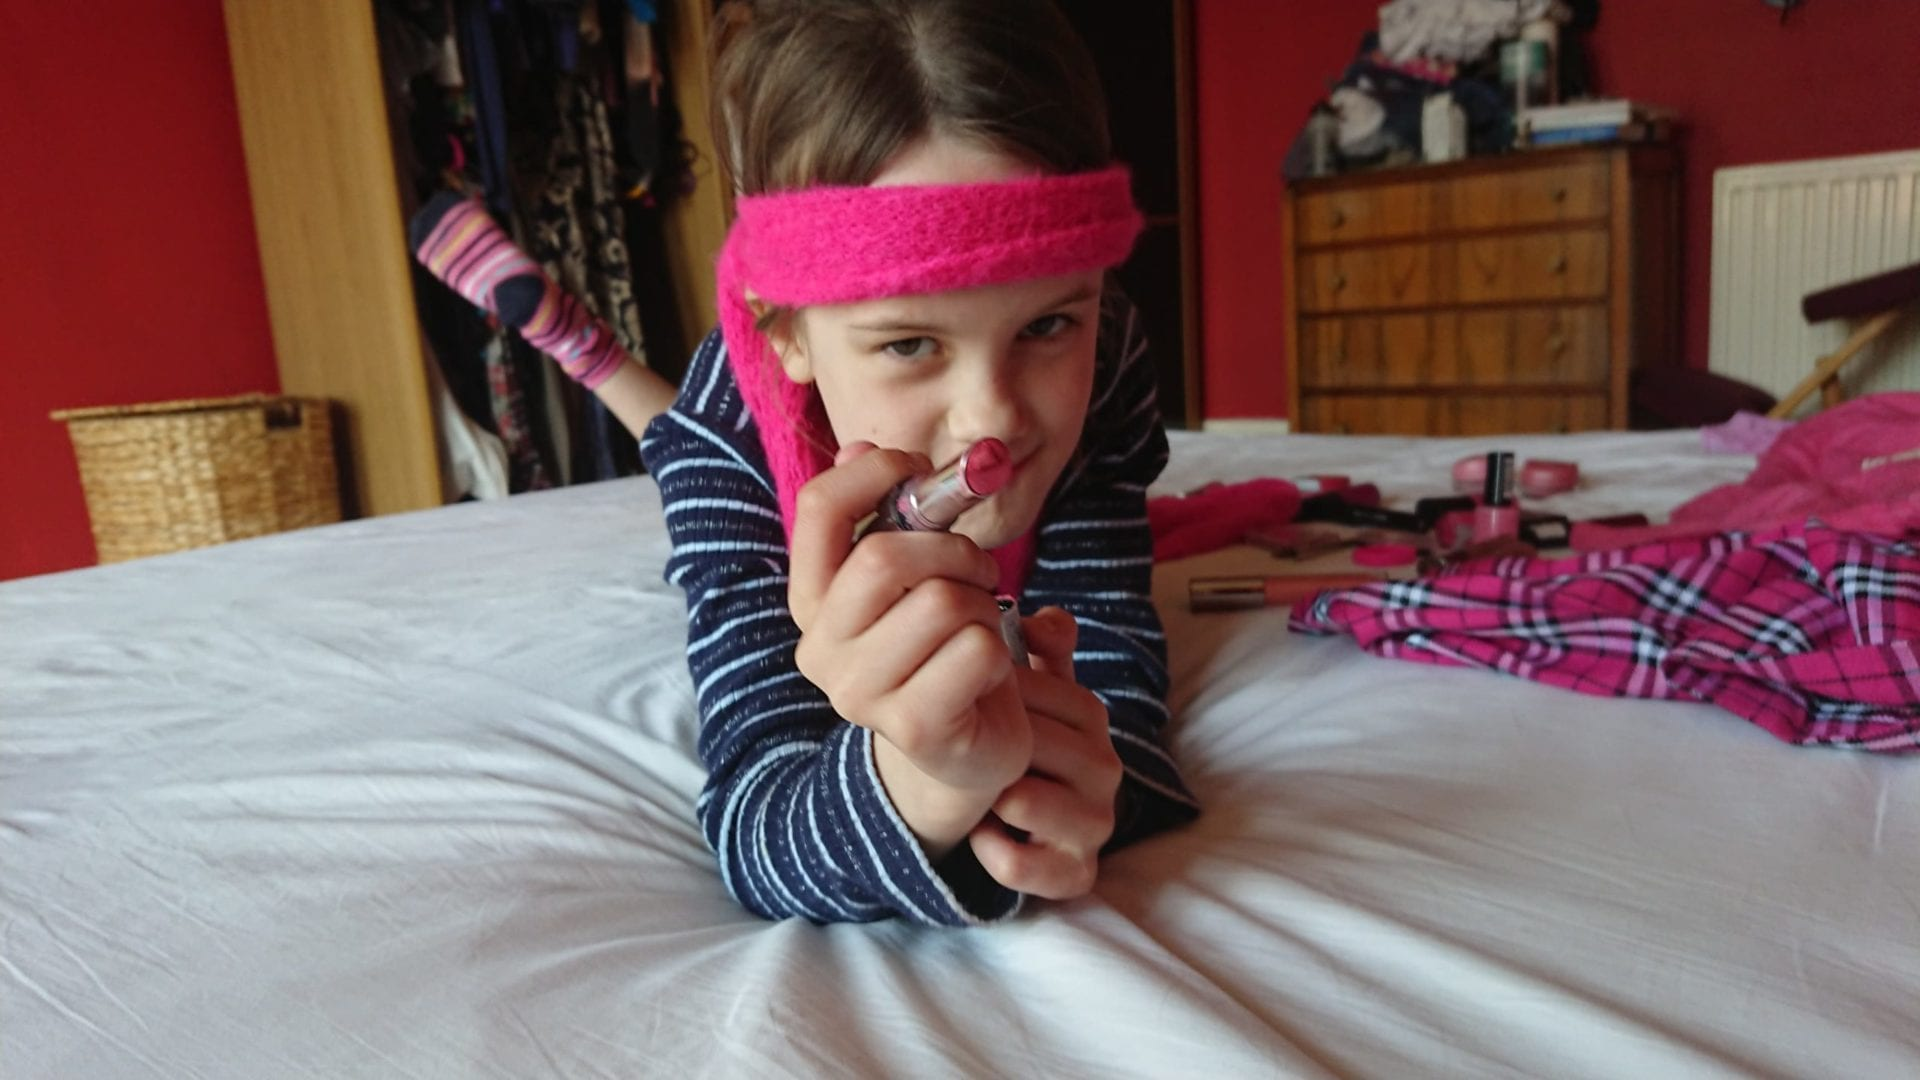 Happy Undiagnosed Children's Day – #paintlockdownpink